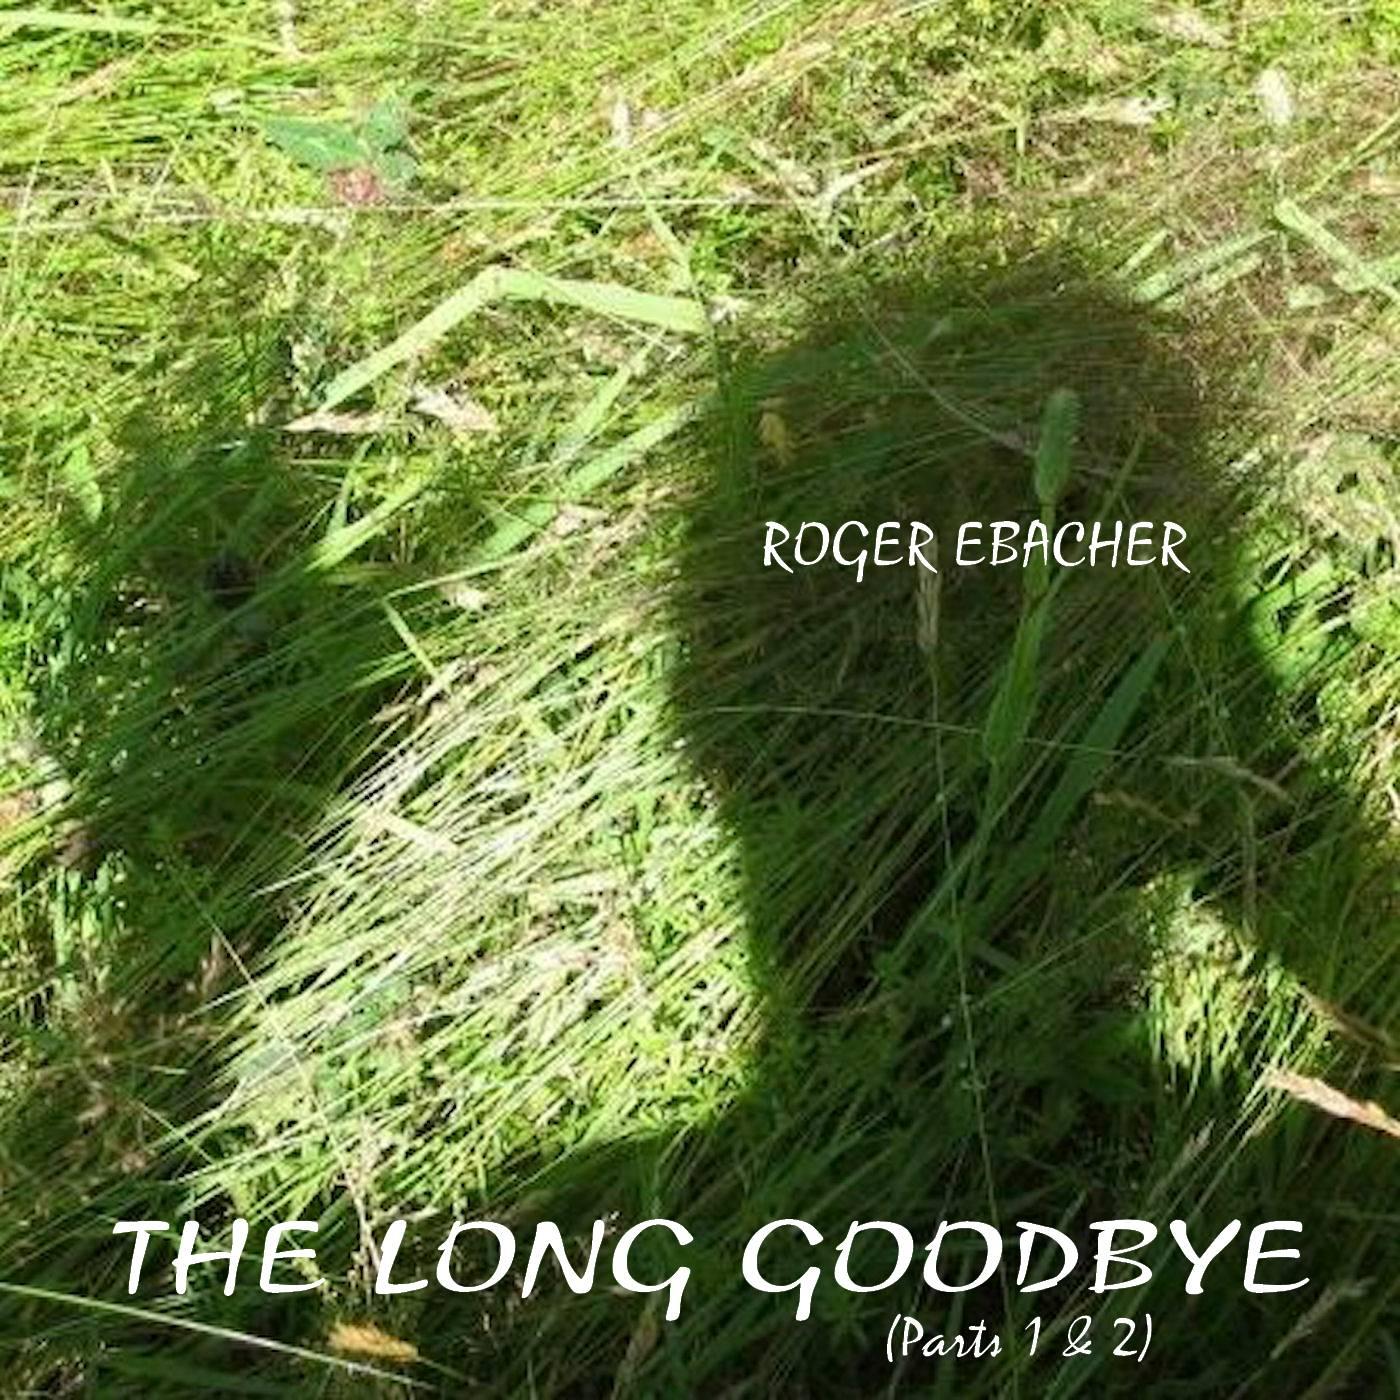 THE LONG GOODBYE (Pts. 1 & 2)